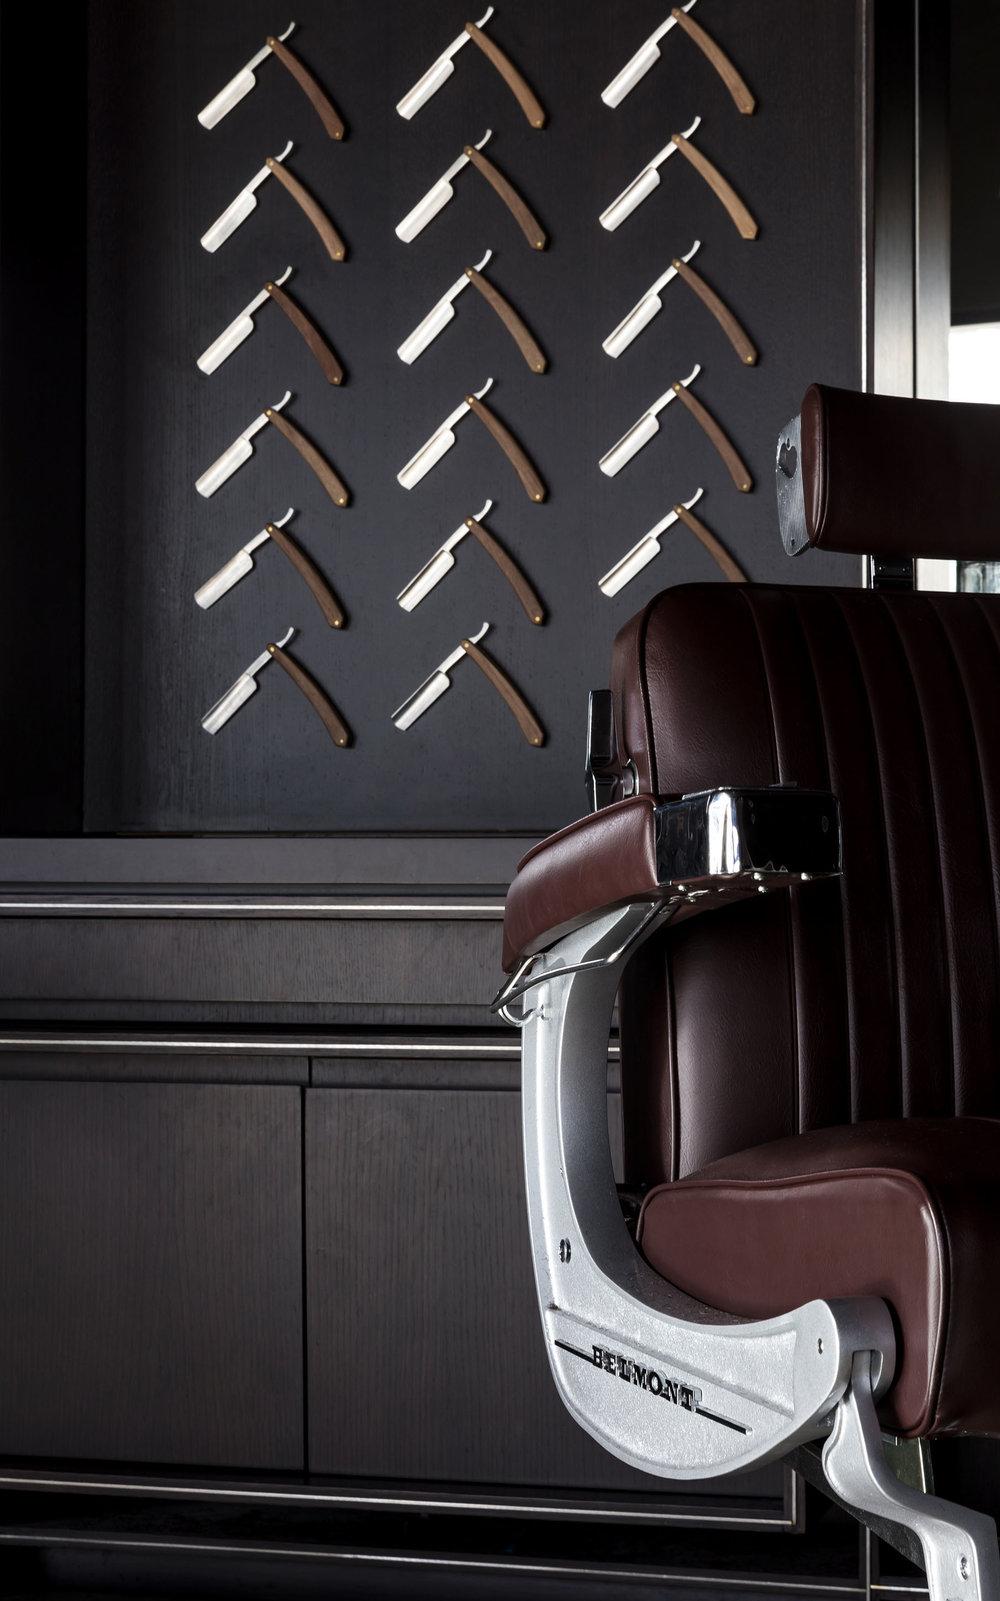 Chaps & Co-JLT-Dubai-Barbershop-Belmont-Brown-Leather-Blades-Joinery-Interior-Architect.jpg